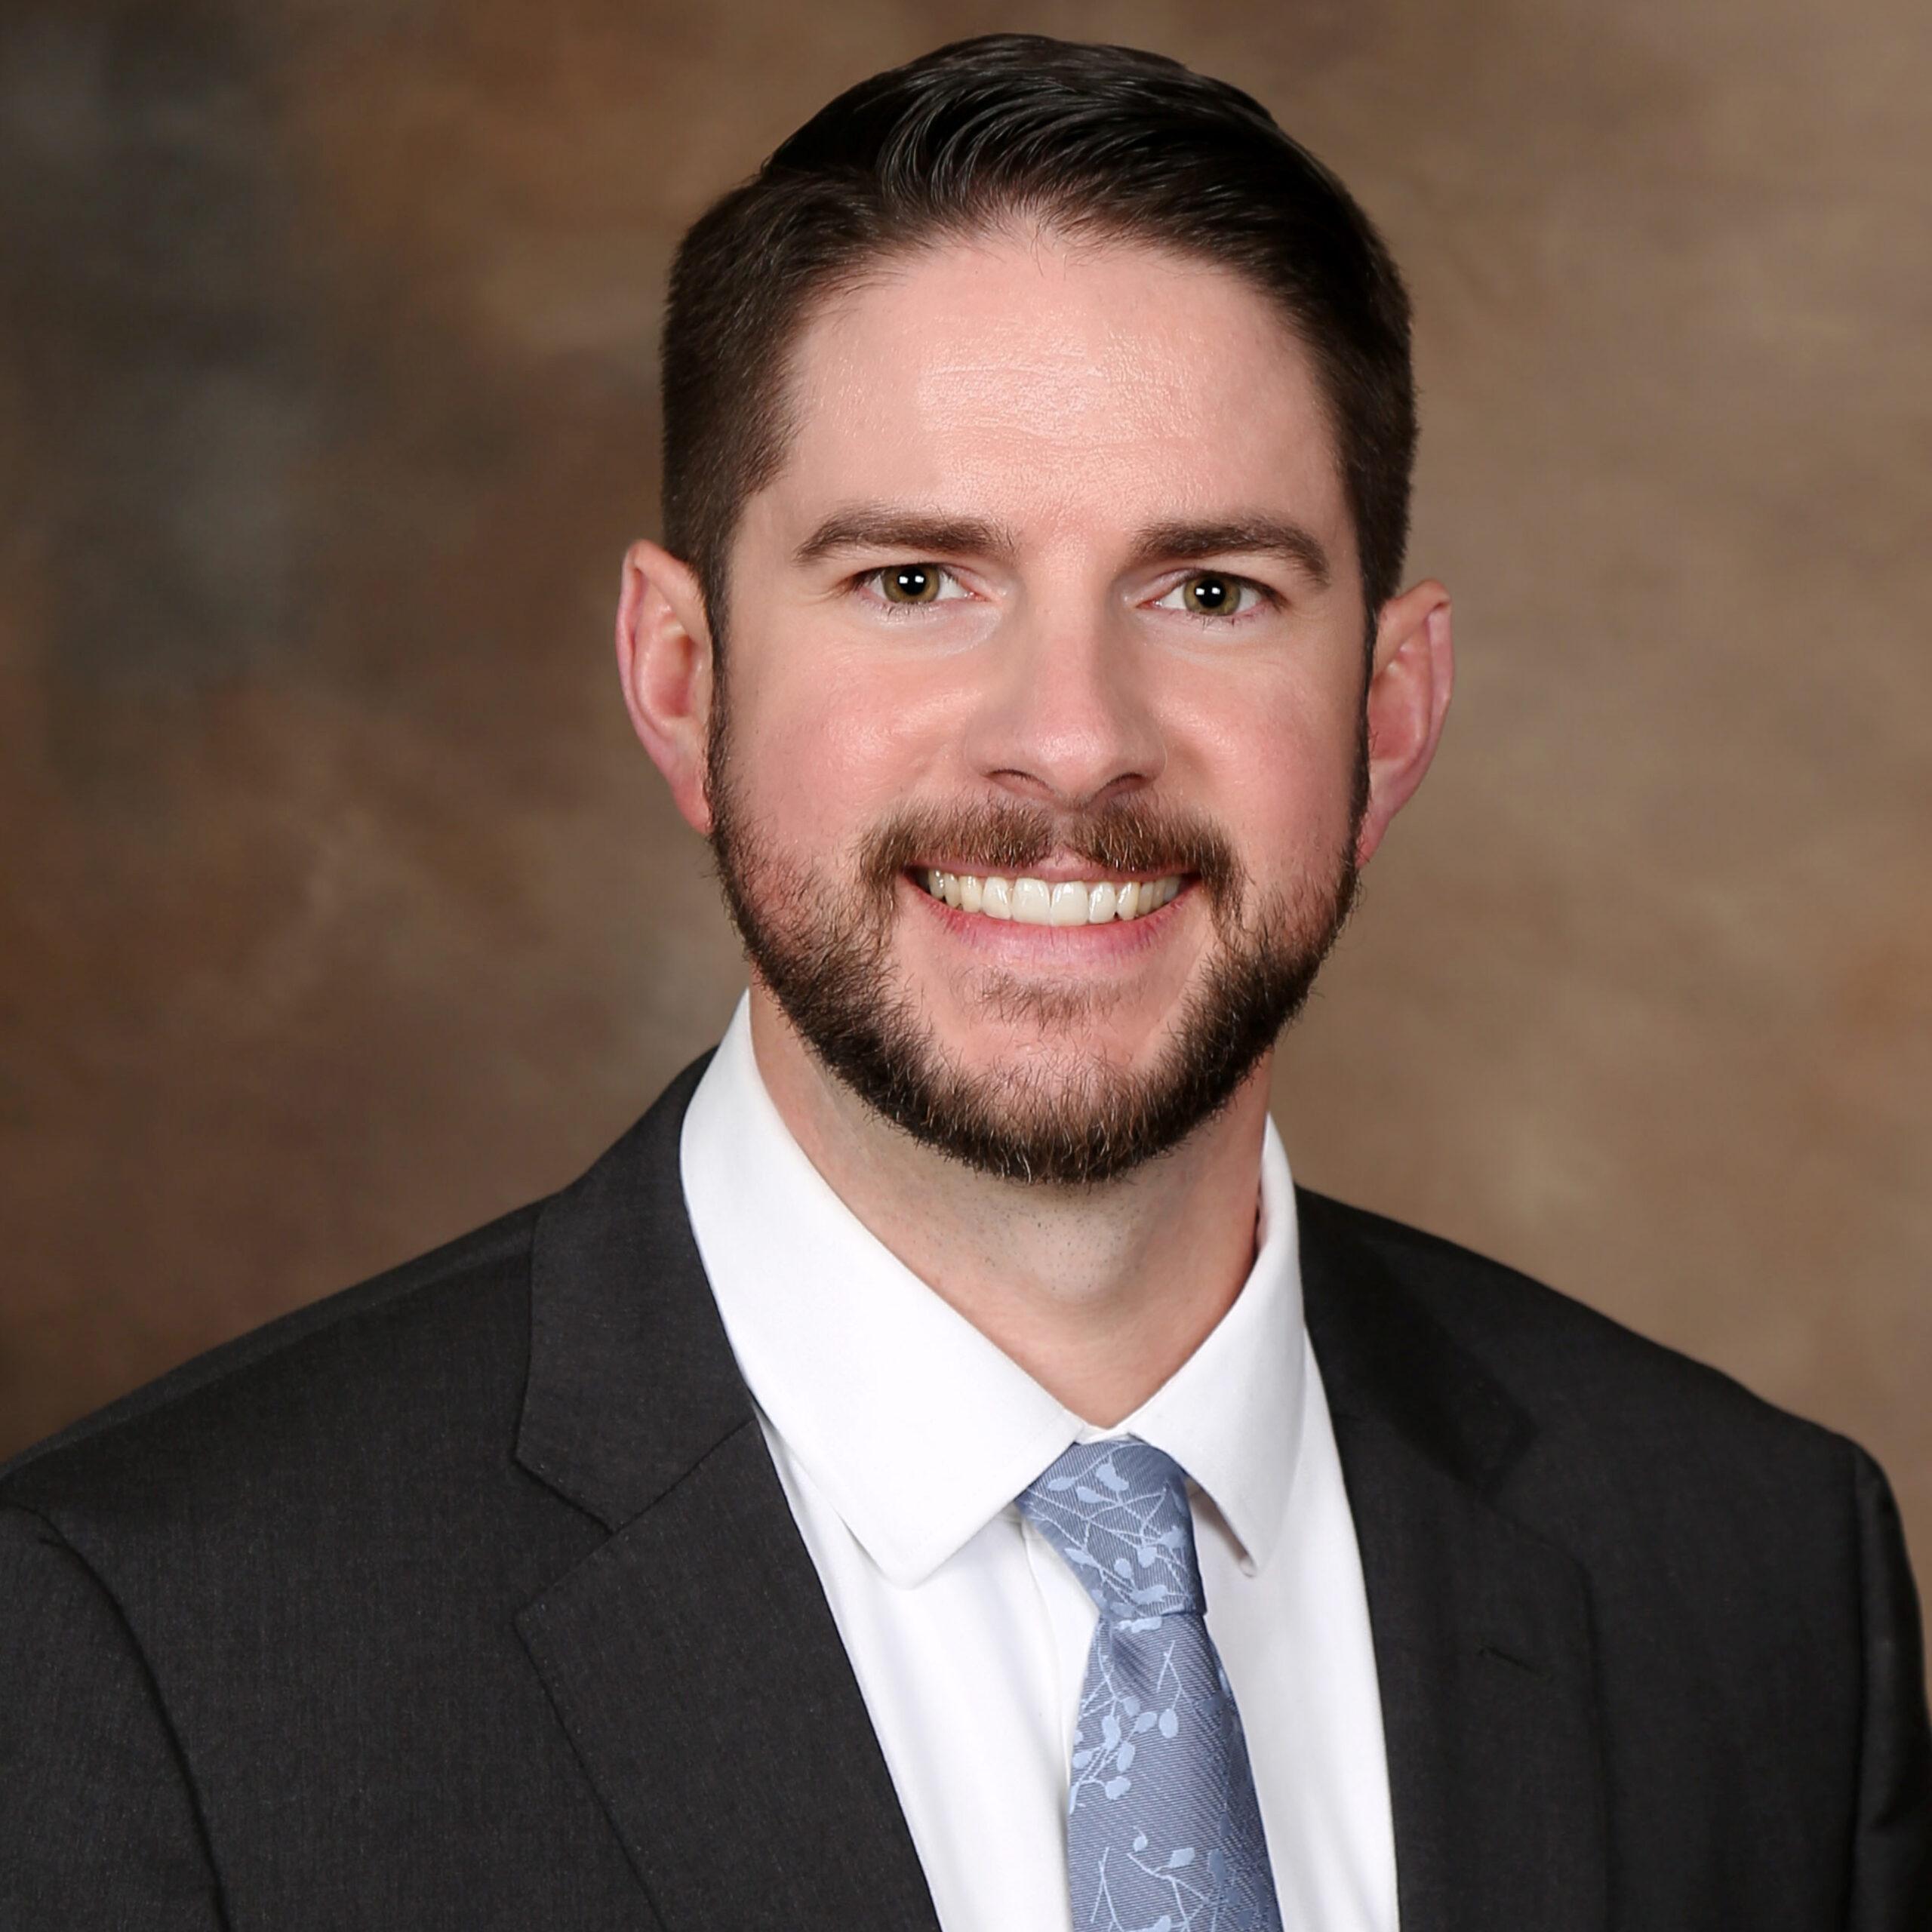 Steve Latham, CFA, CFP® | Chief Investment Officer